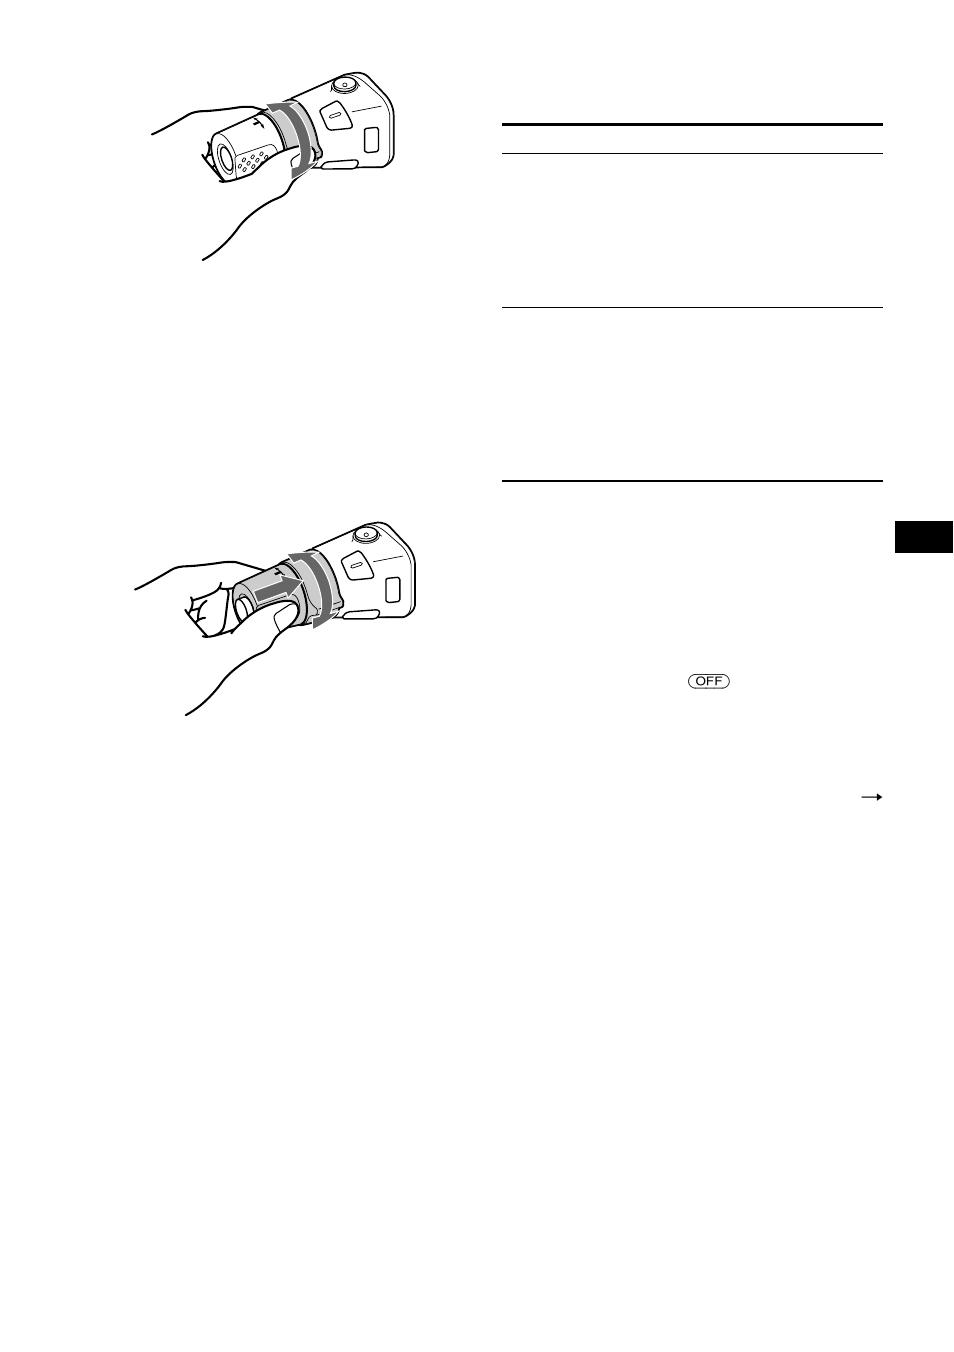 medium resolution of sony cdx fw700 wiring diagram wiring diagram third levelsony cdx fw700 user manual page 19 60